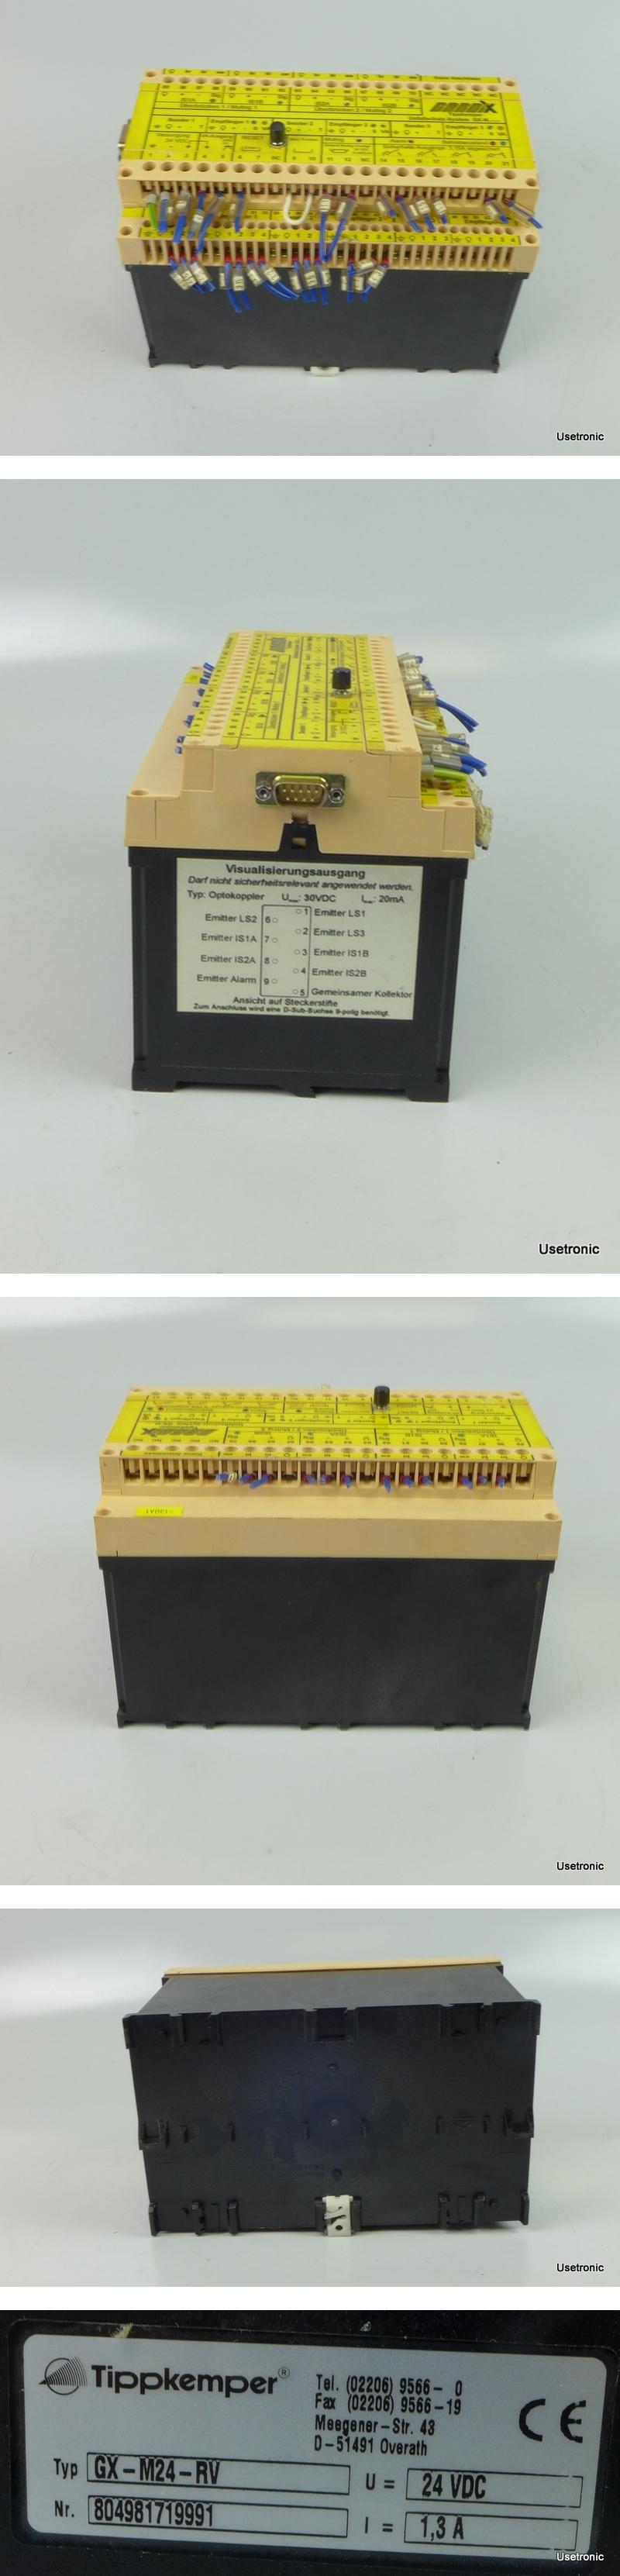 Tippkemper GX-M24-RV